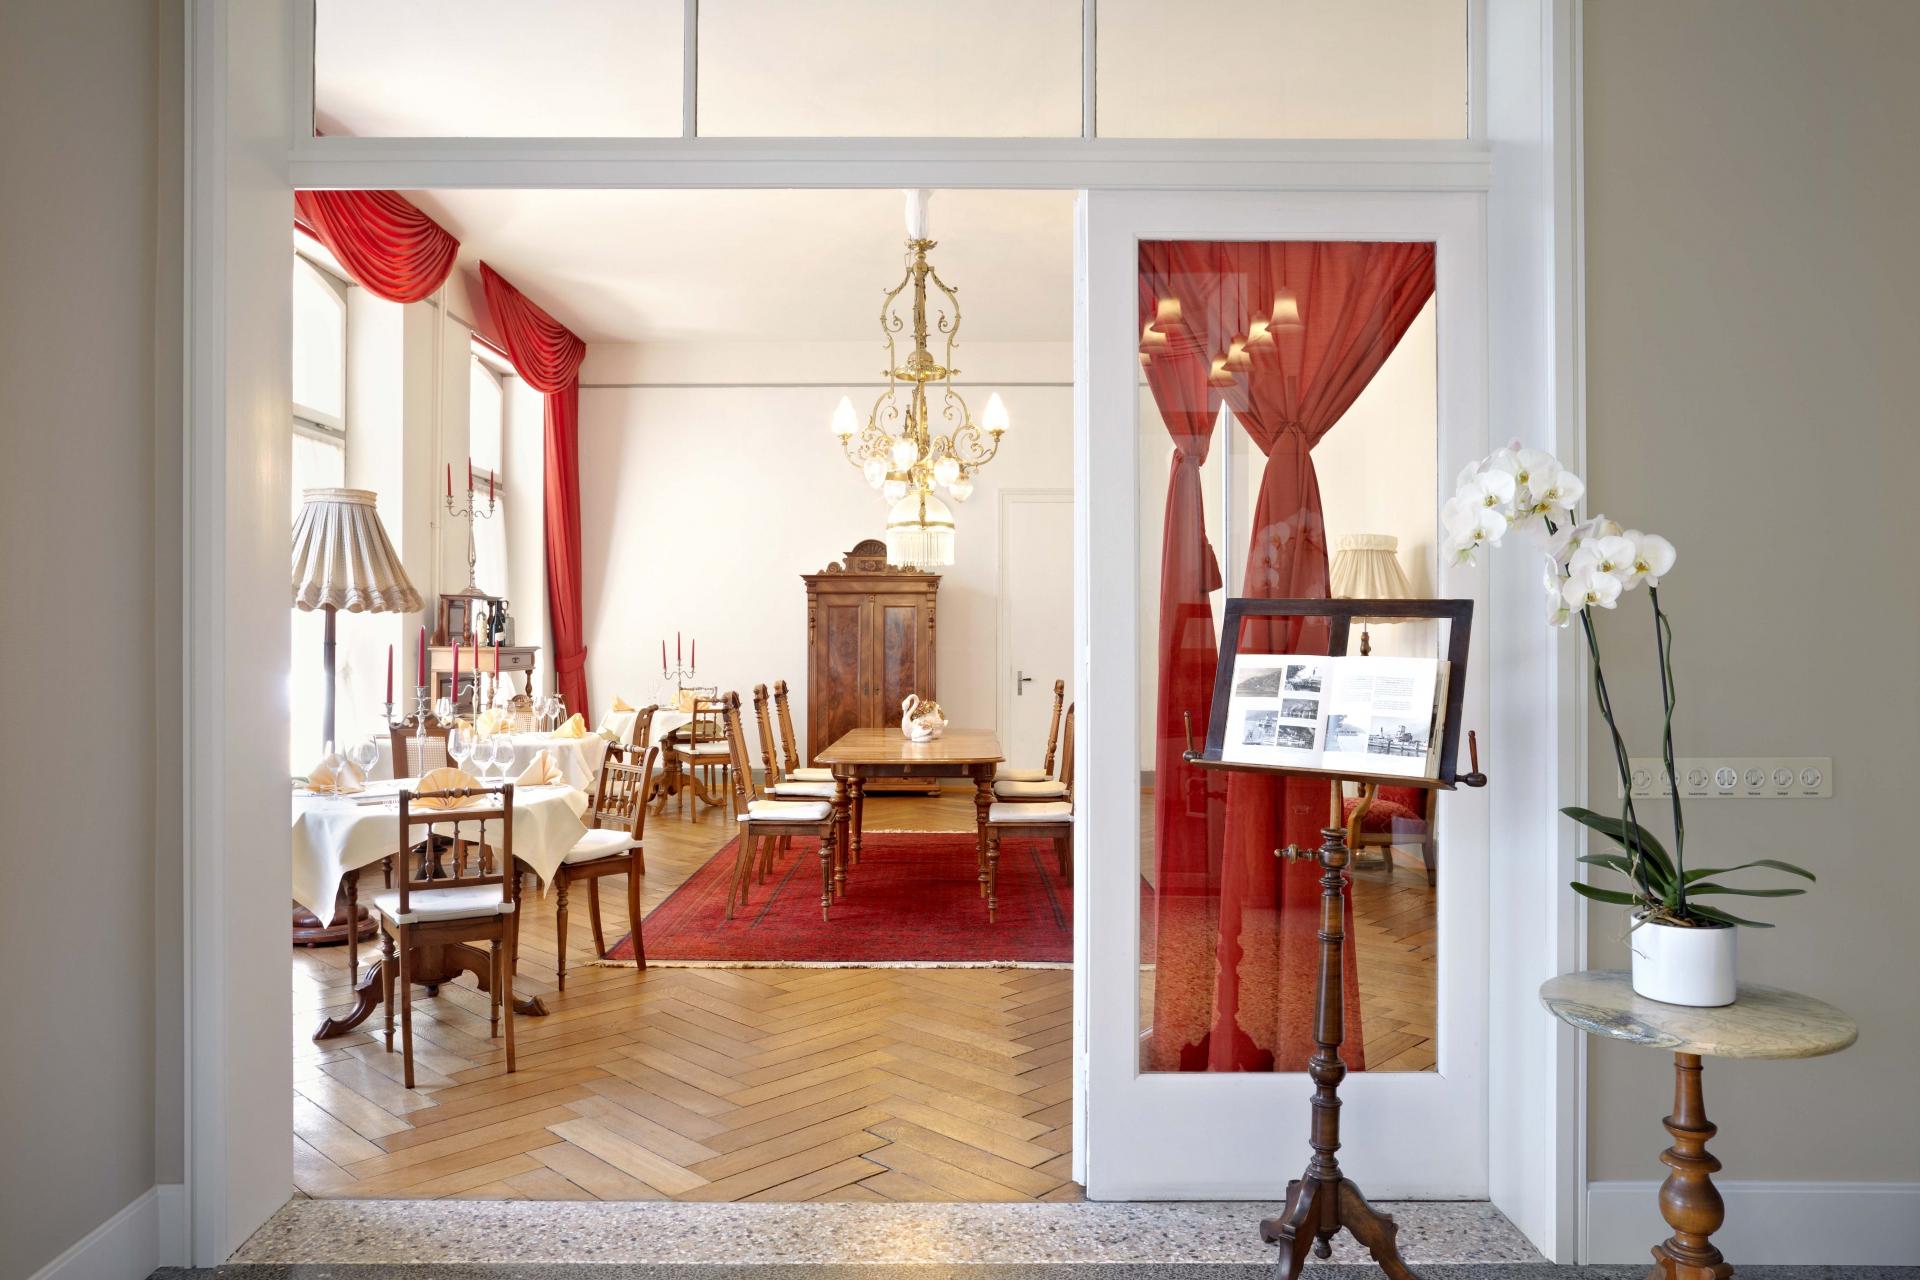 winterrestaurant hotel terrasse am see. Black Bedroom Furniture Sets. Home Design Ideas